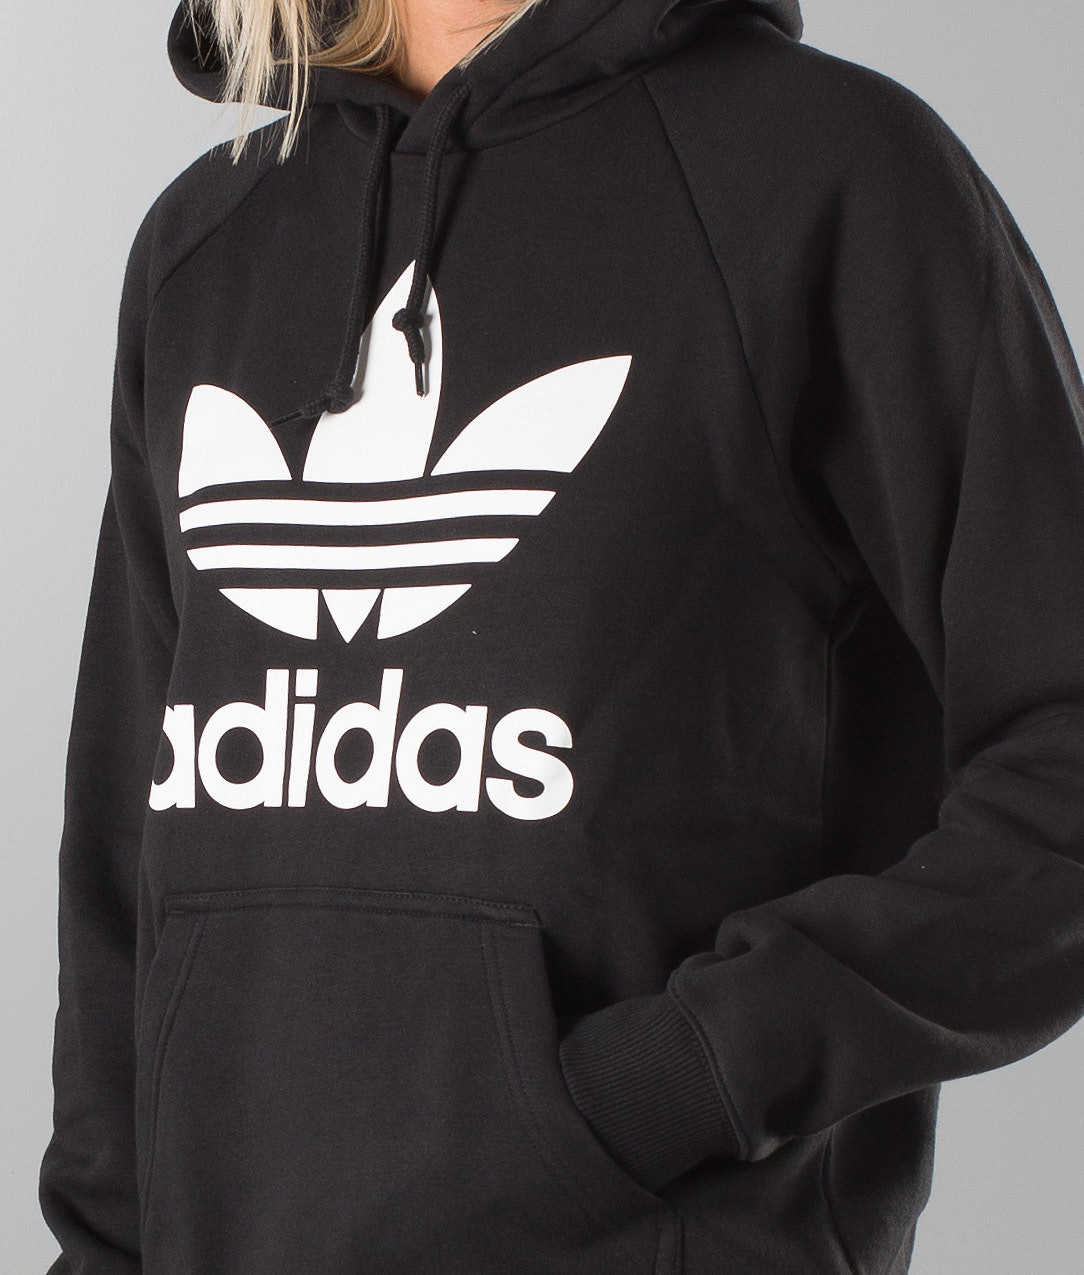 Adidas Originals Trefoil Unisex Huppari Black - Ridestore.fi 2bb2e75532